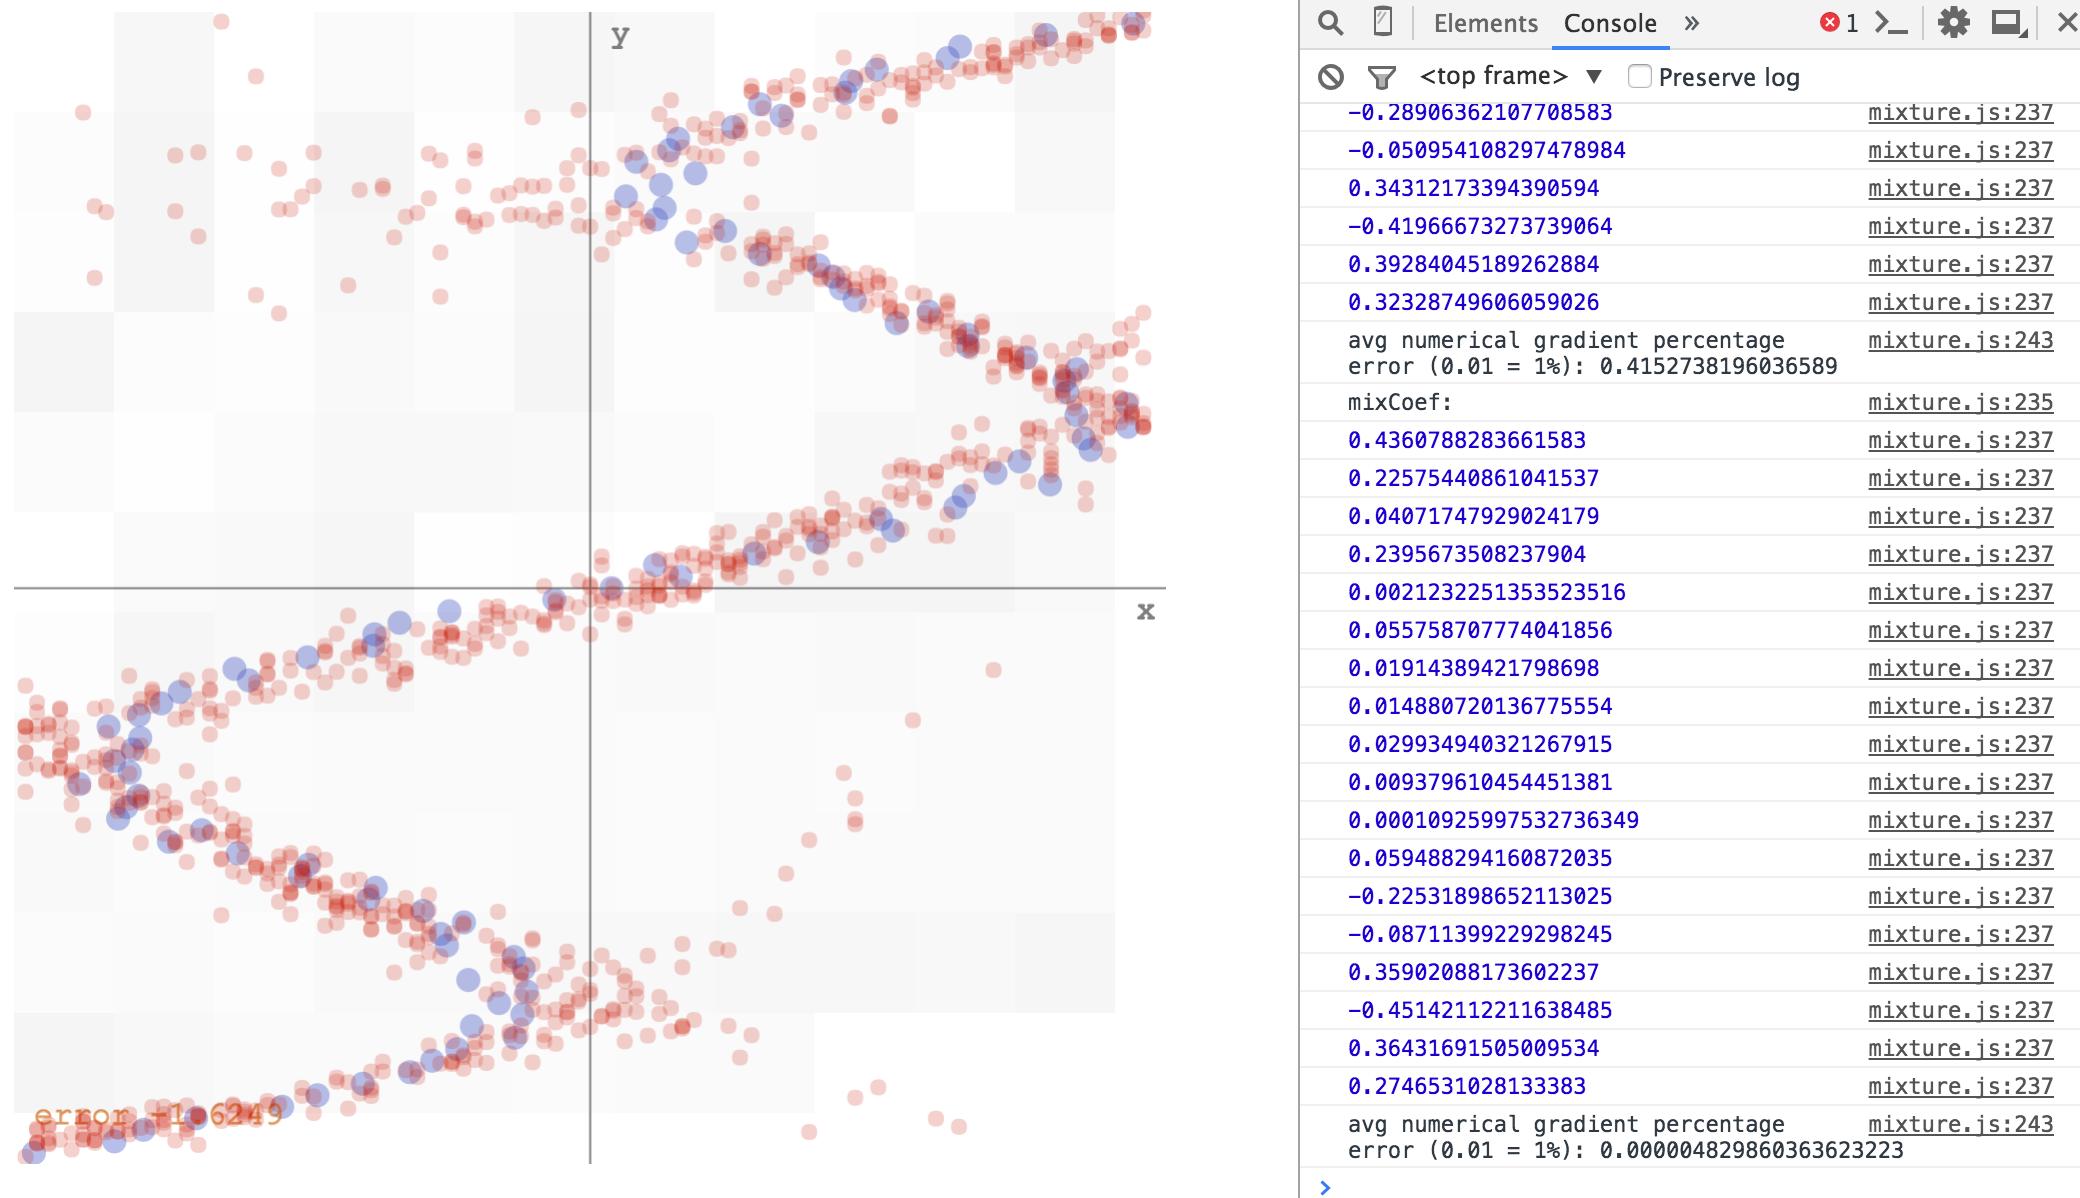 Mixture Density Networks